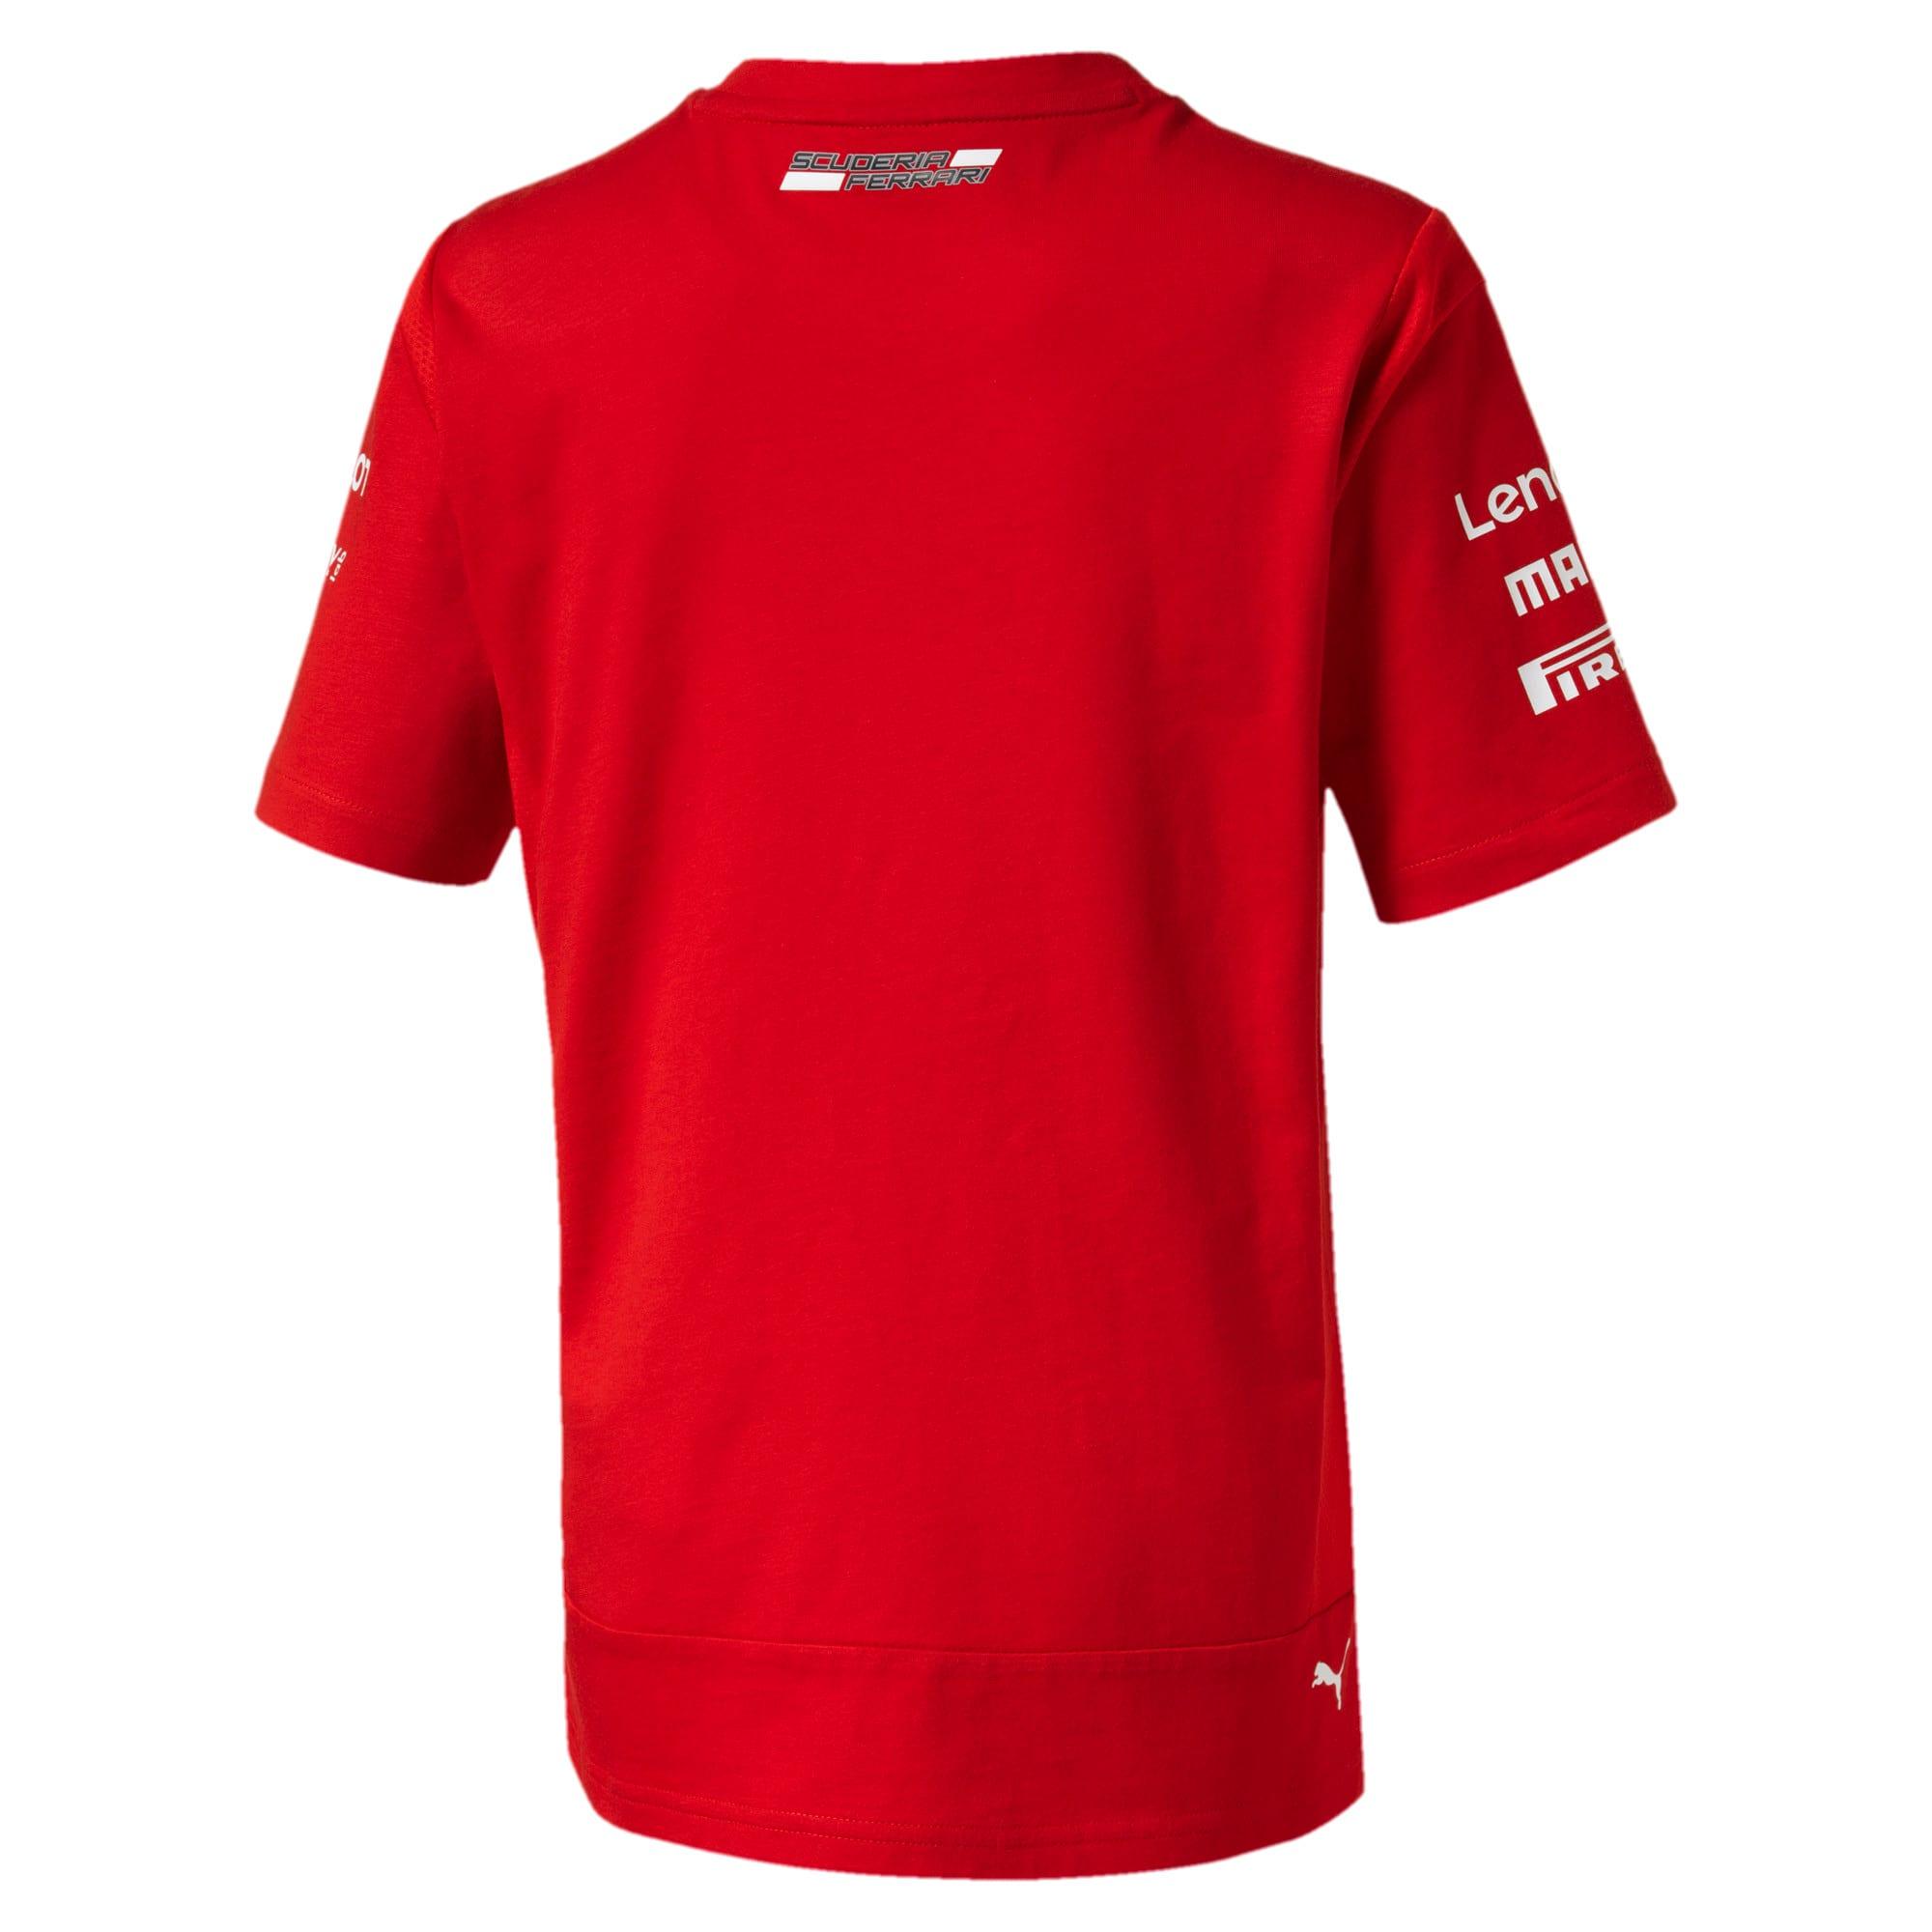 Thumbnail 2 of Ferrari Team Boys' Tee, Rosso Corsa, medium